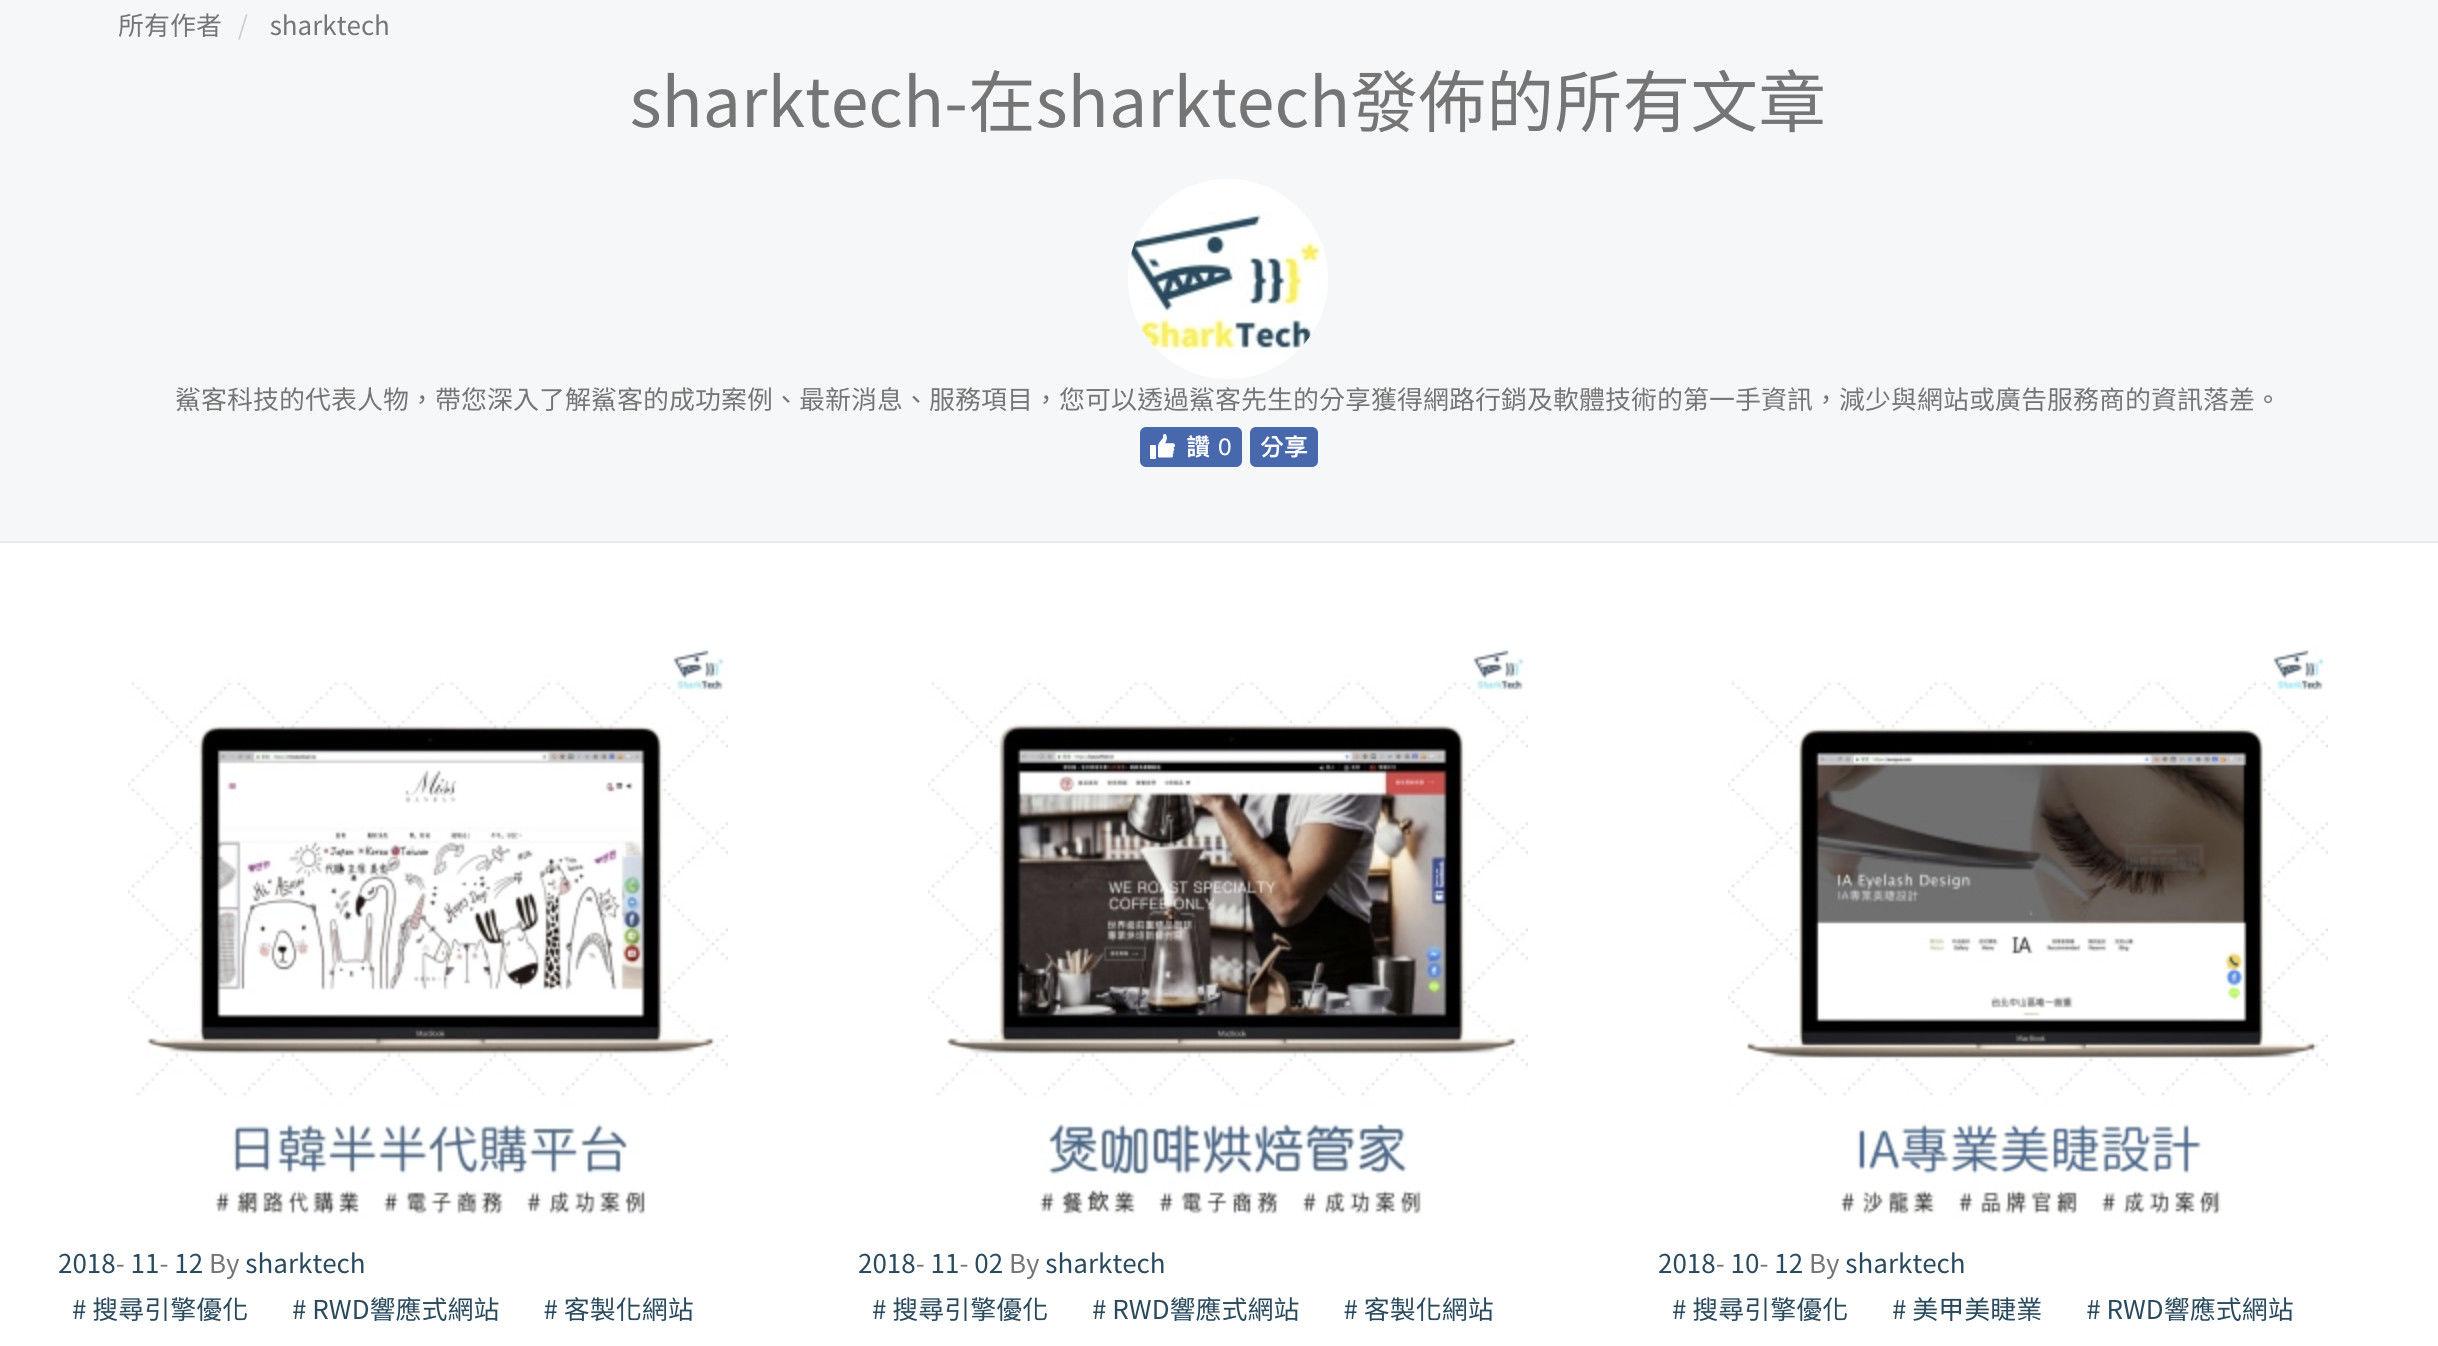 SharkEC寫手專屬頁面,增加站內連結Interlink-鯊客科技網站SEO優化公司